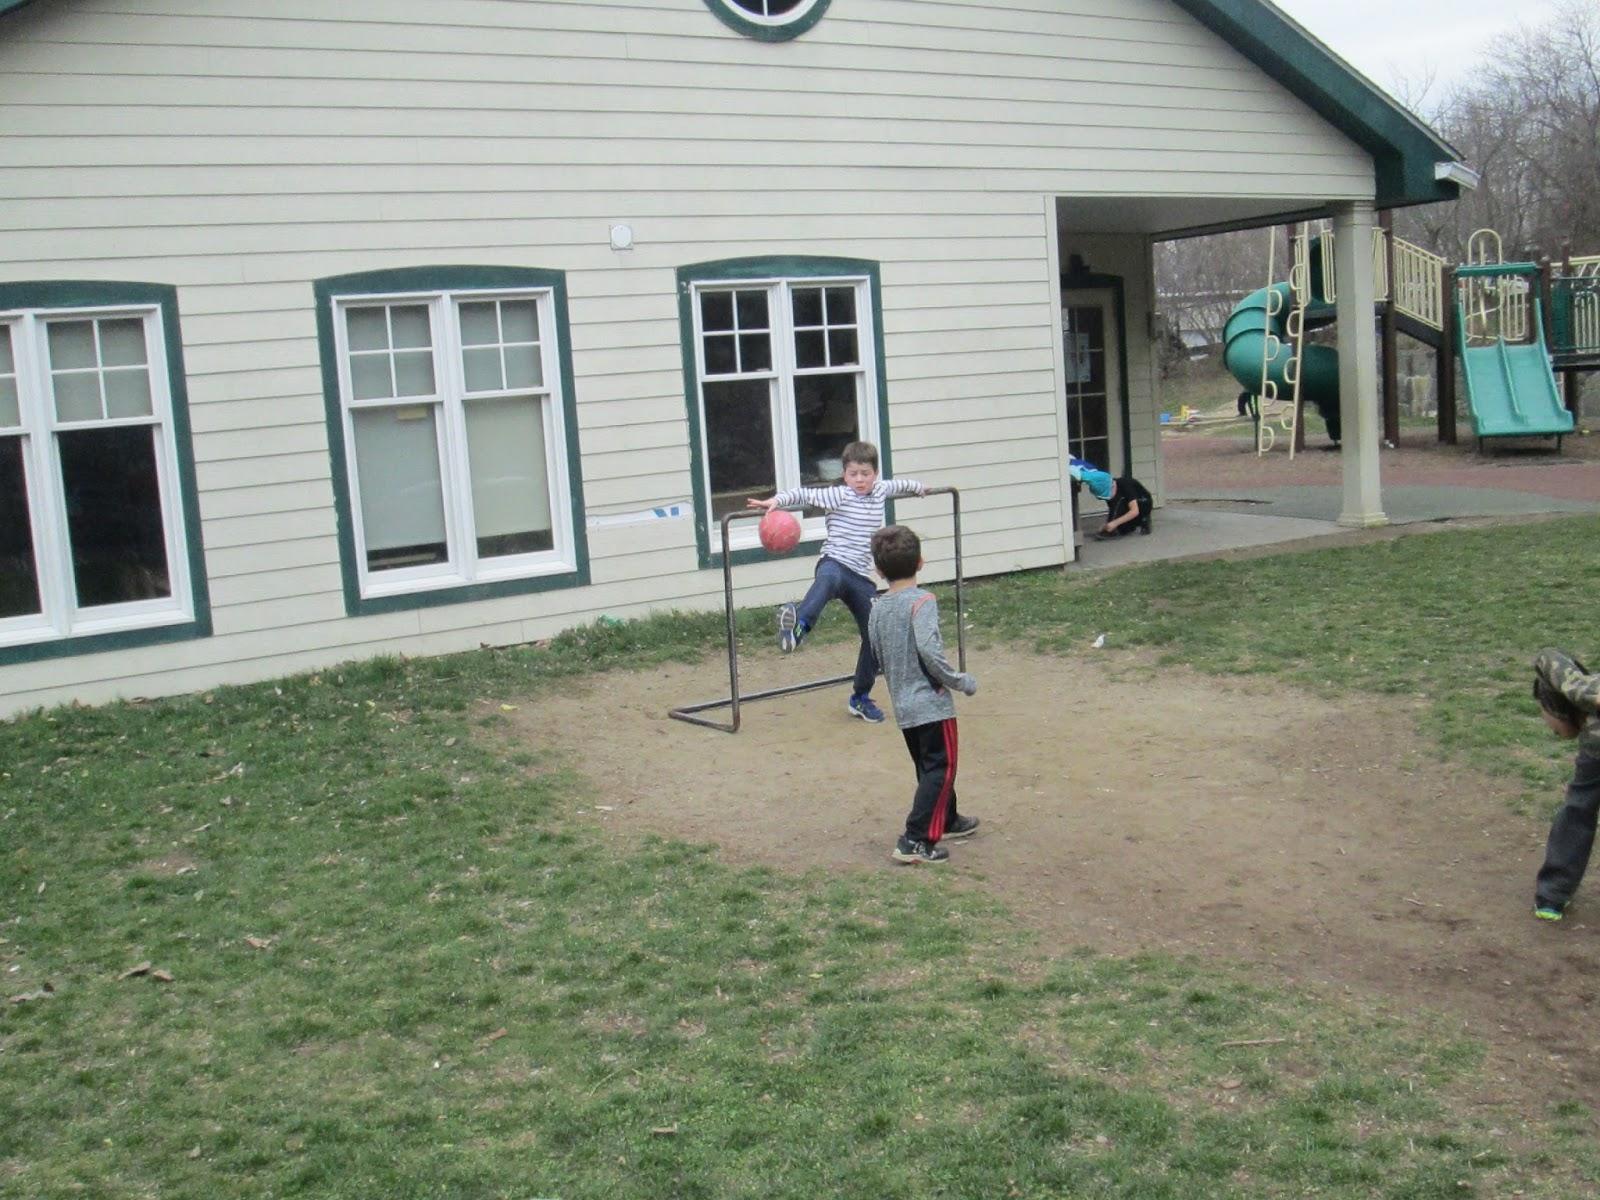 Rich Monetti Writes: Mt Kisco Childcare - Spring Break and ...